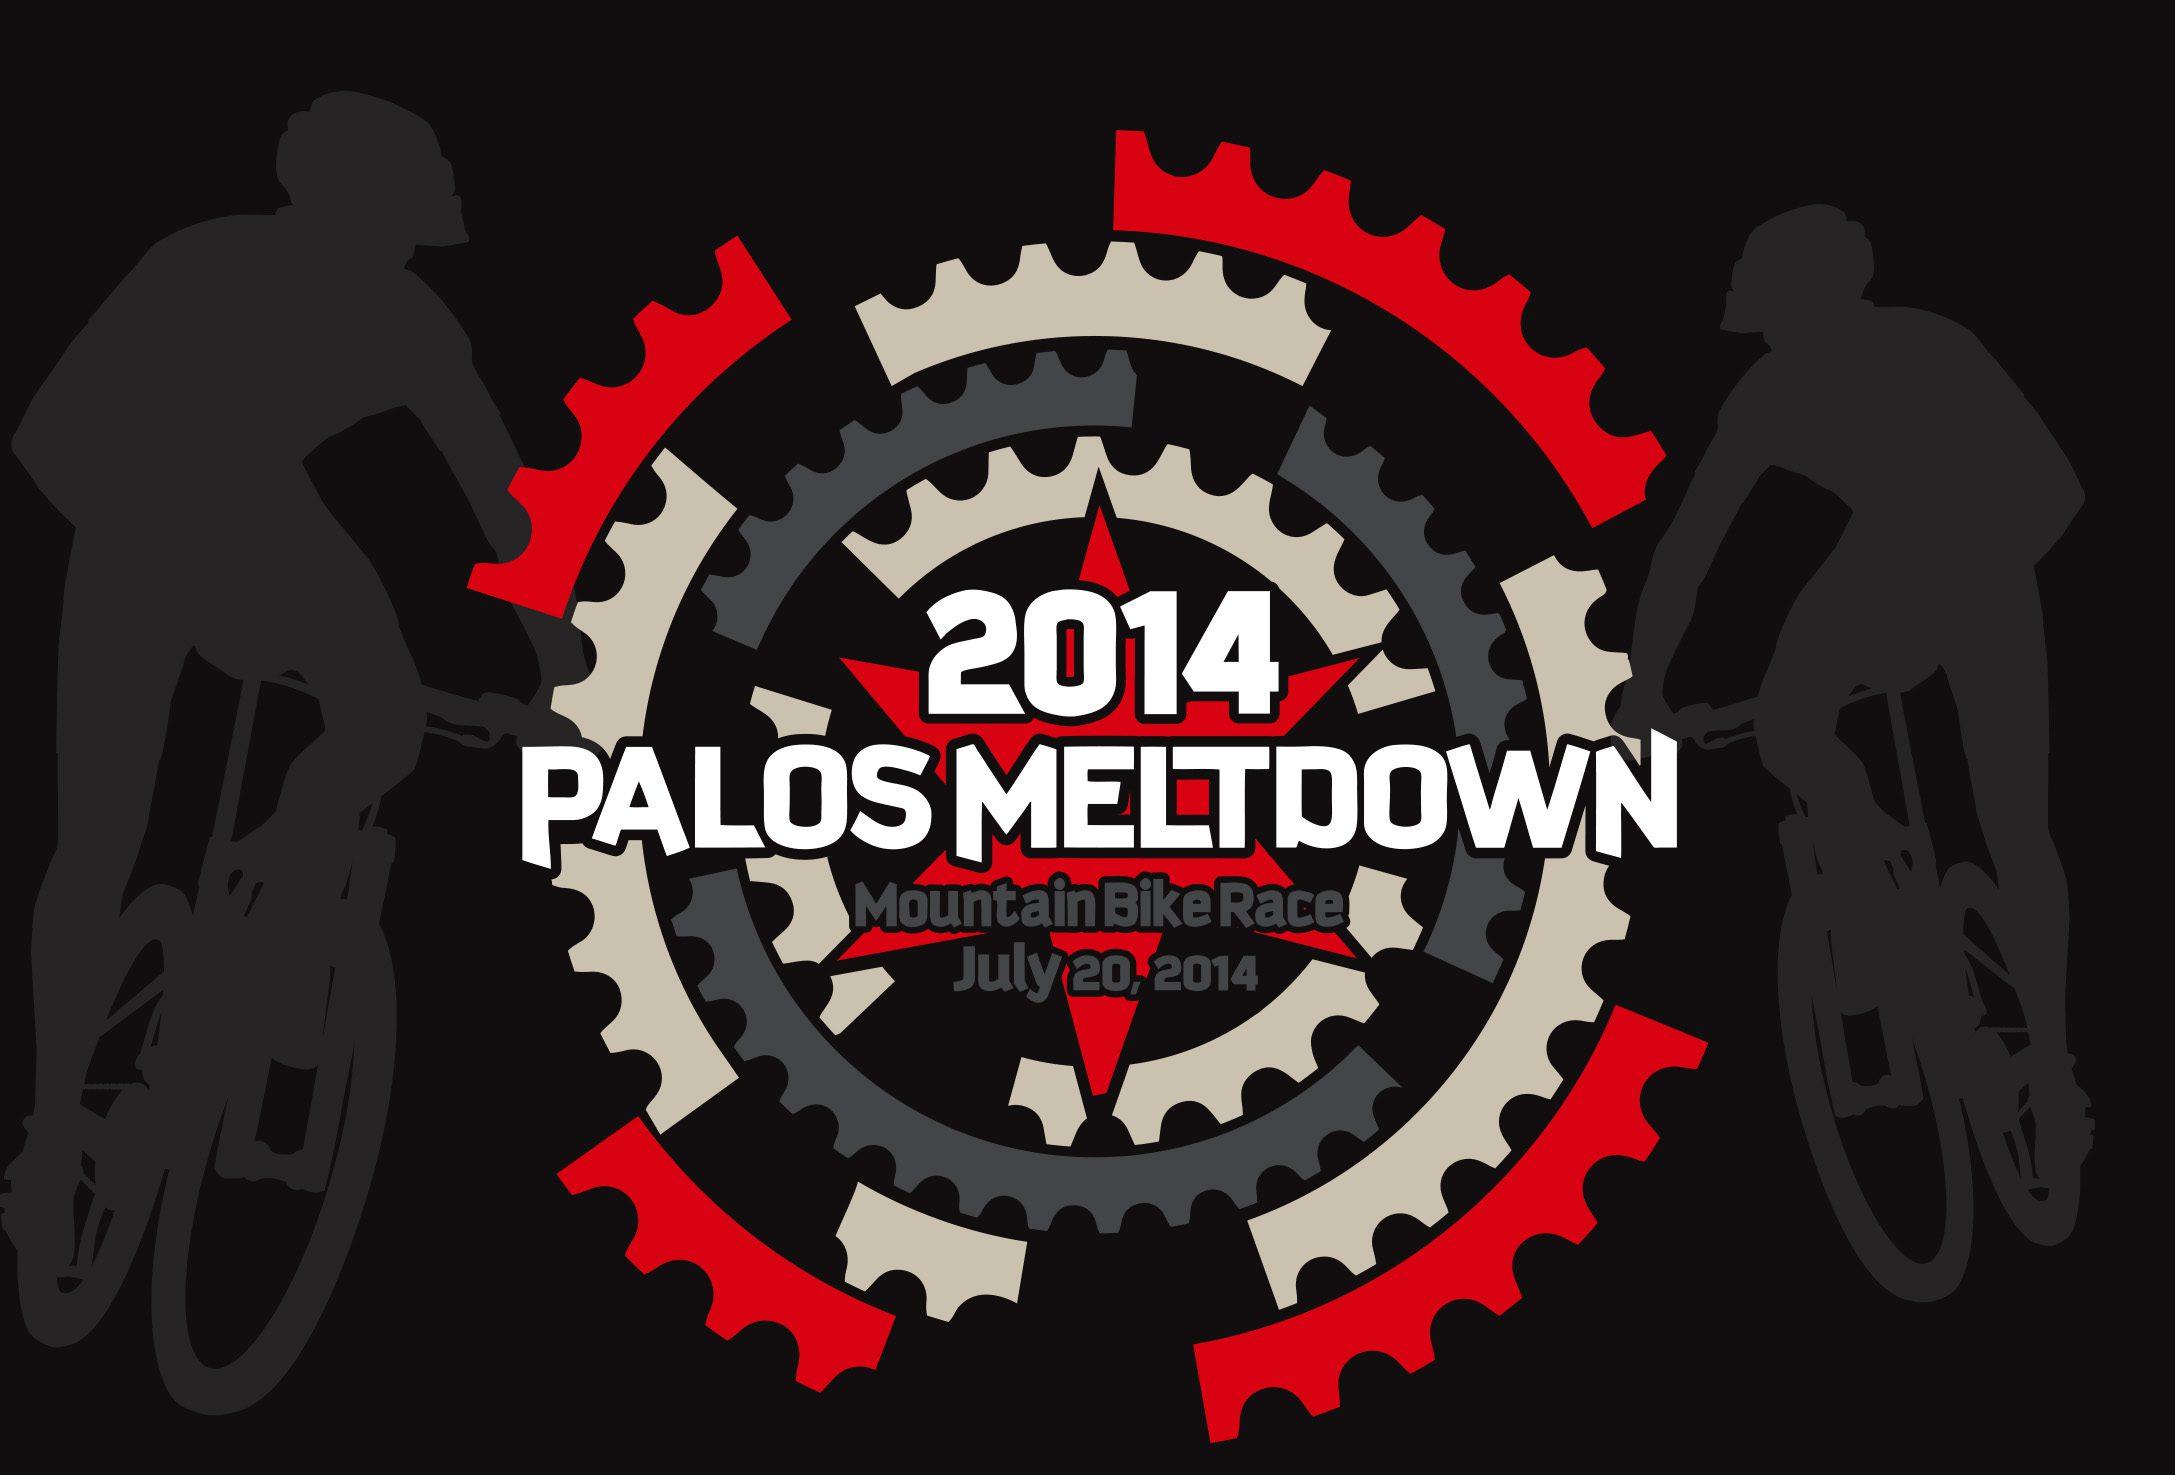 Palos Meltdown